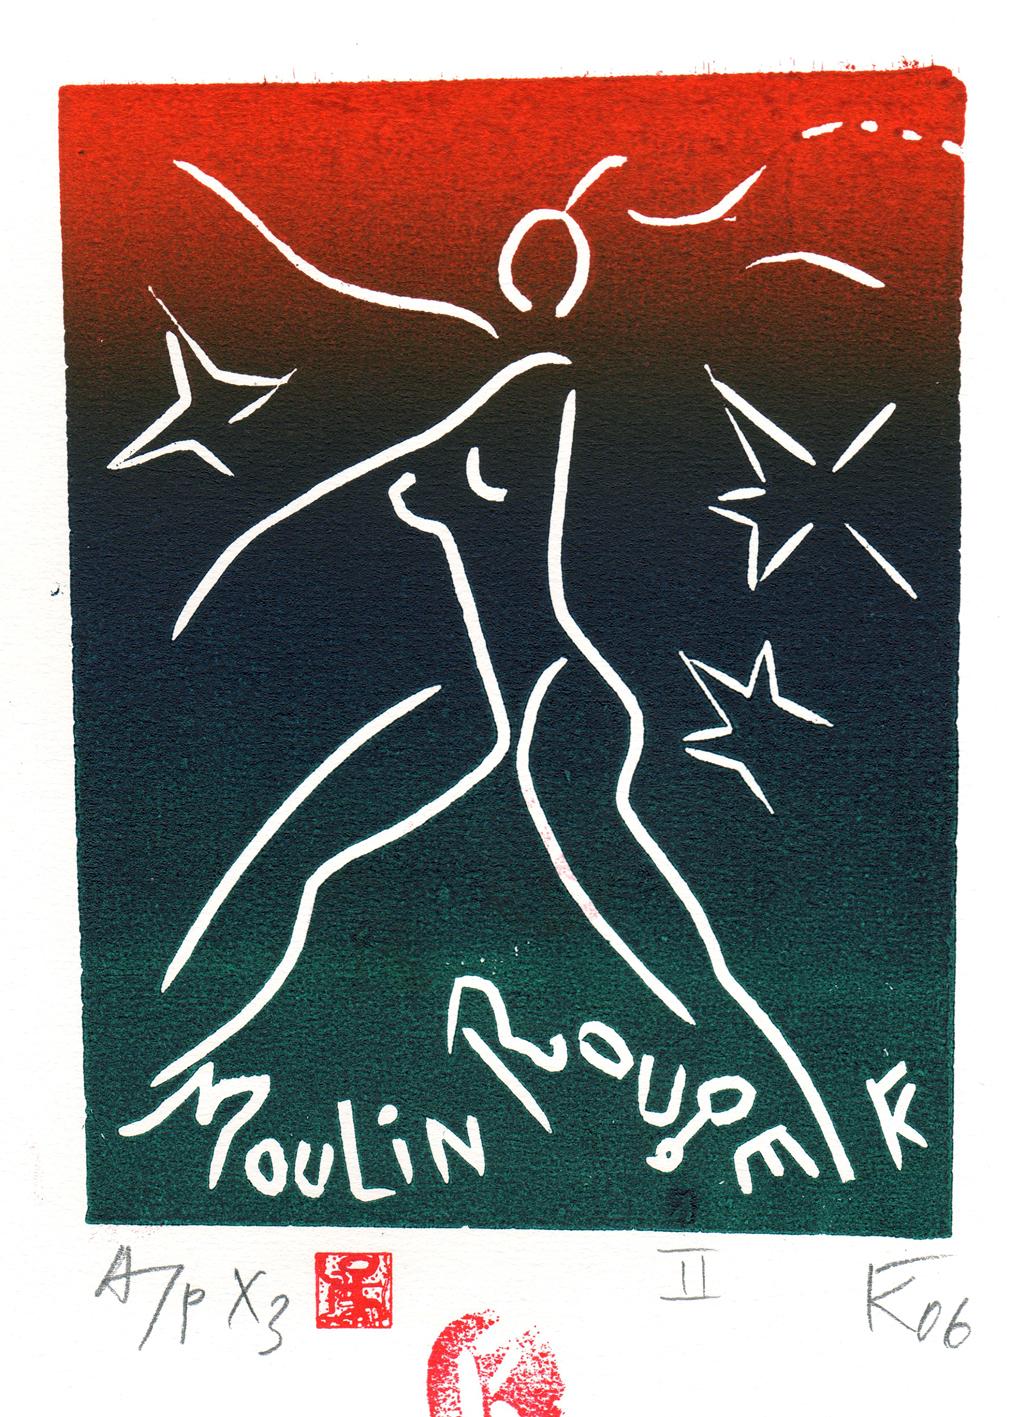 Картинки по запросу Георгий Ковенчук мулен руж в живописи